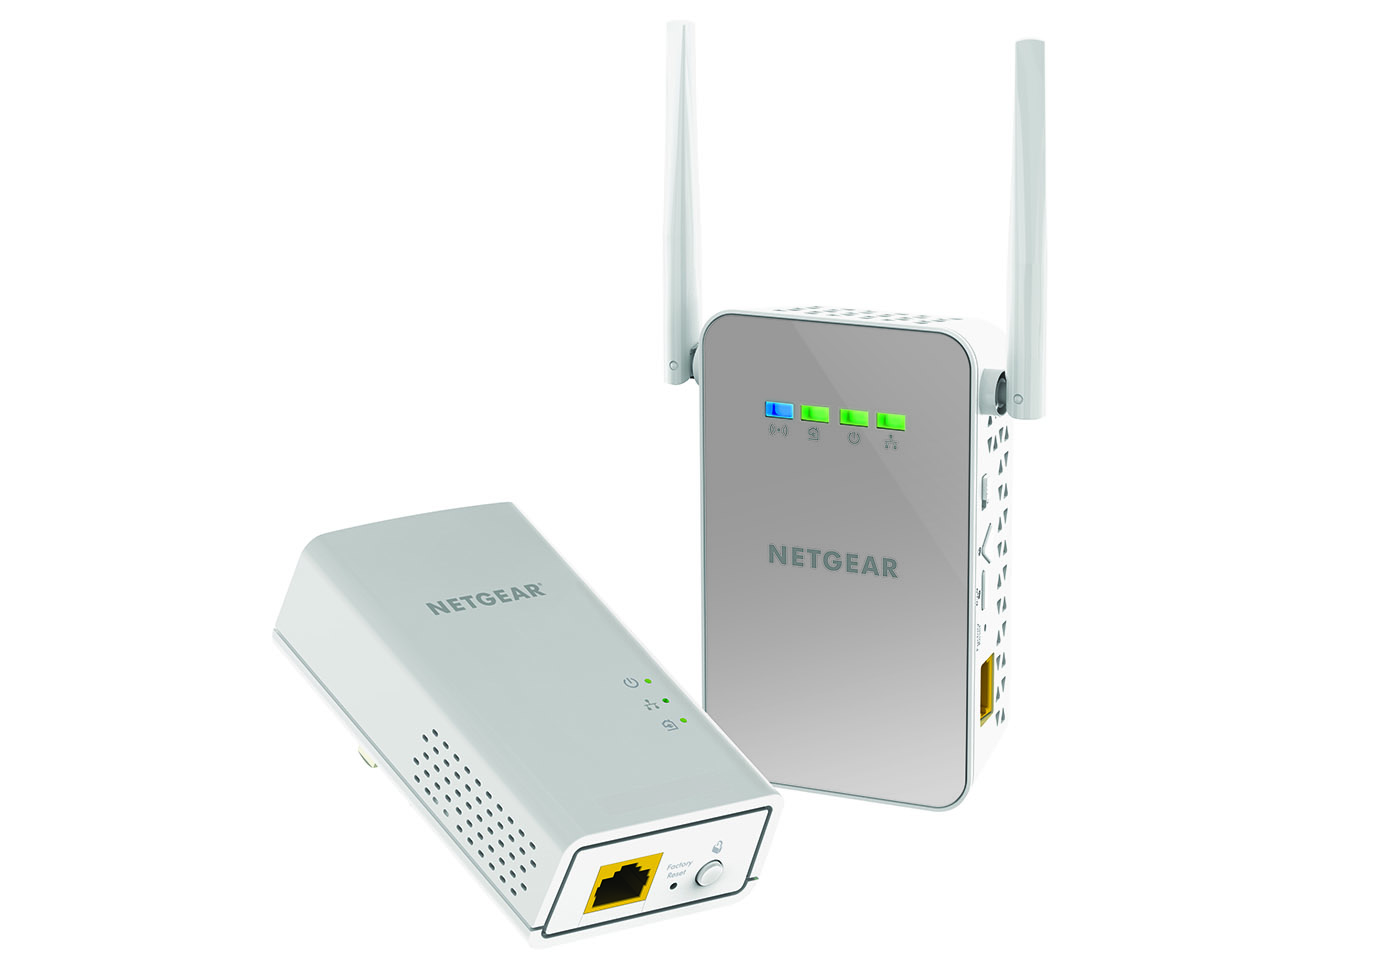 Wireless - Magazine cover